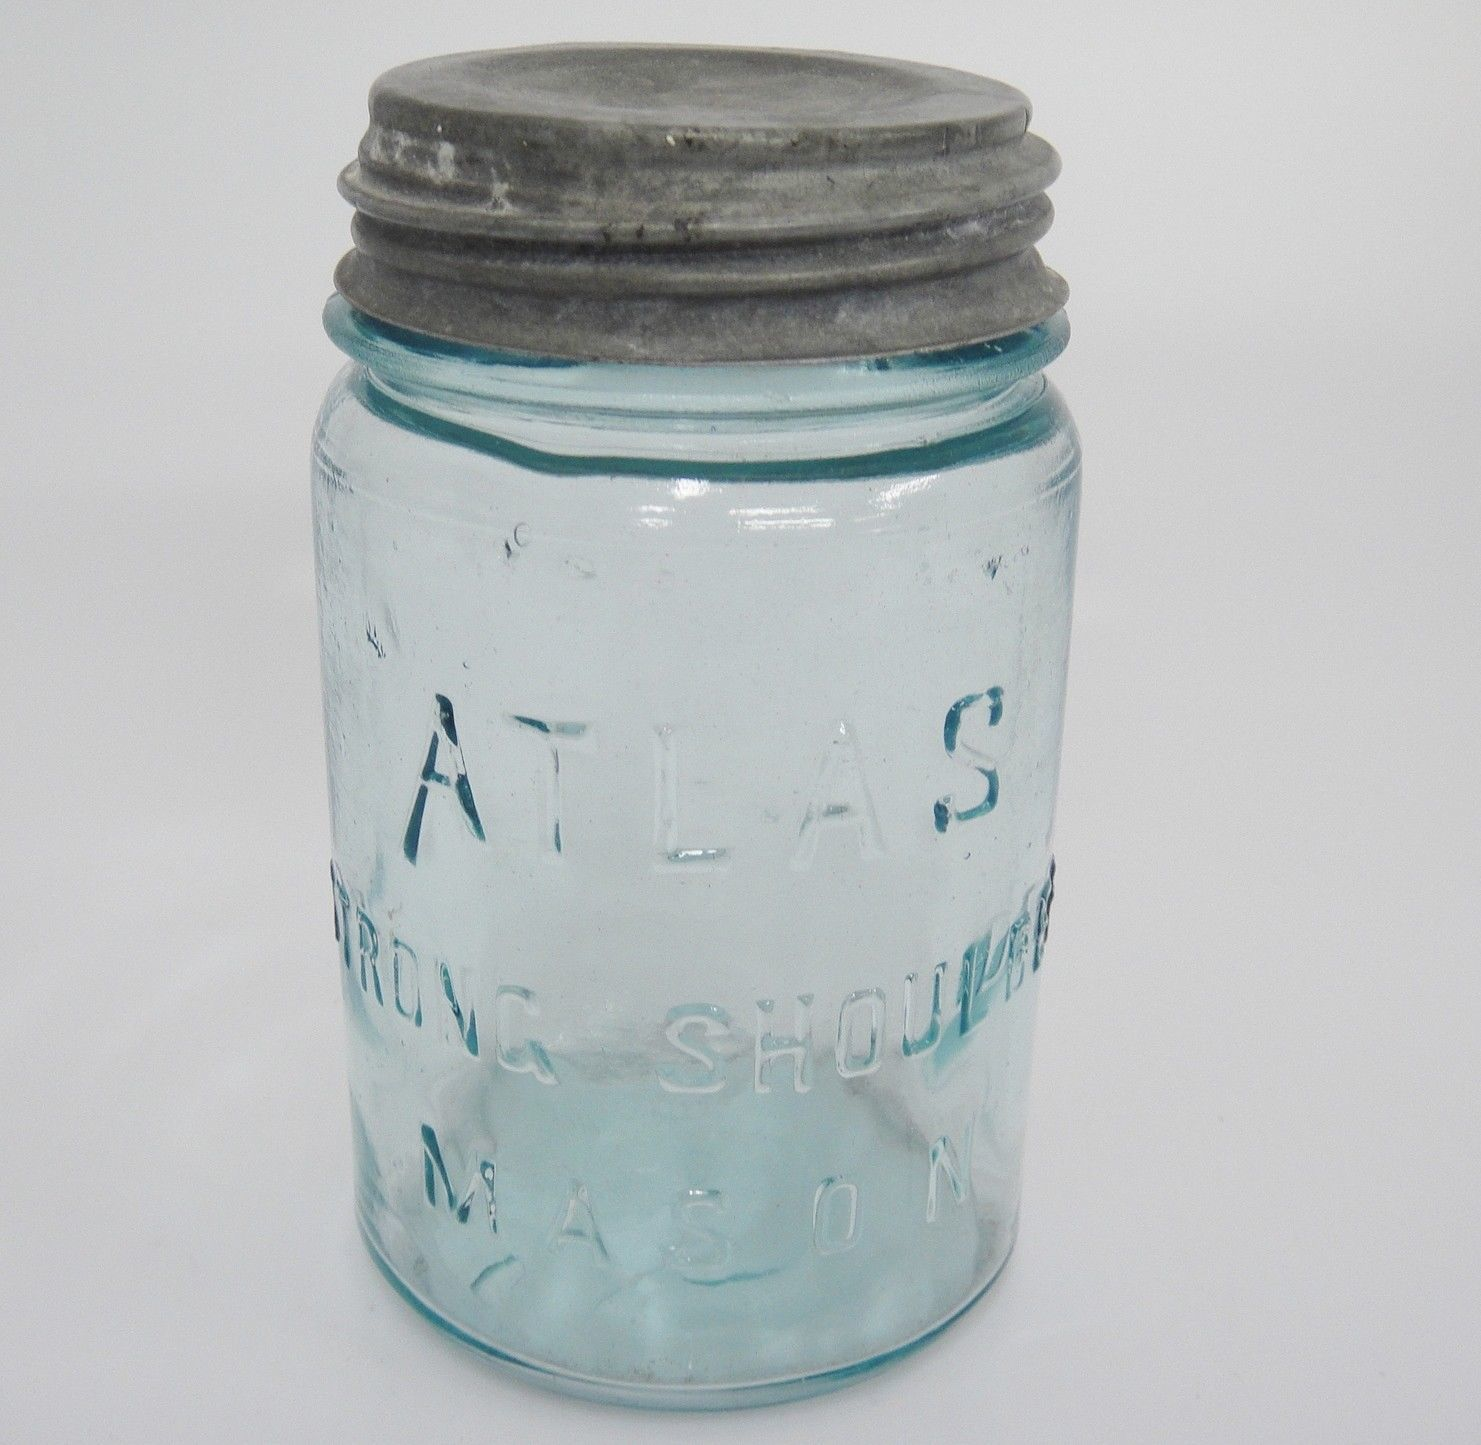 57. 57. Atlas Strong Shoulder Mason 7 Green Glass Jar ...